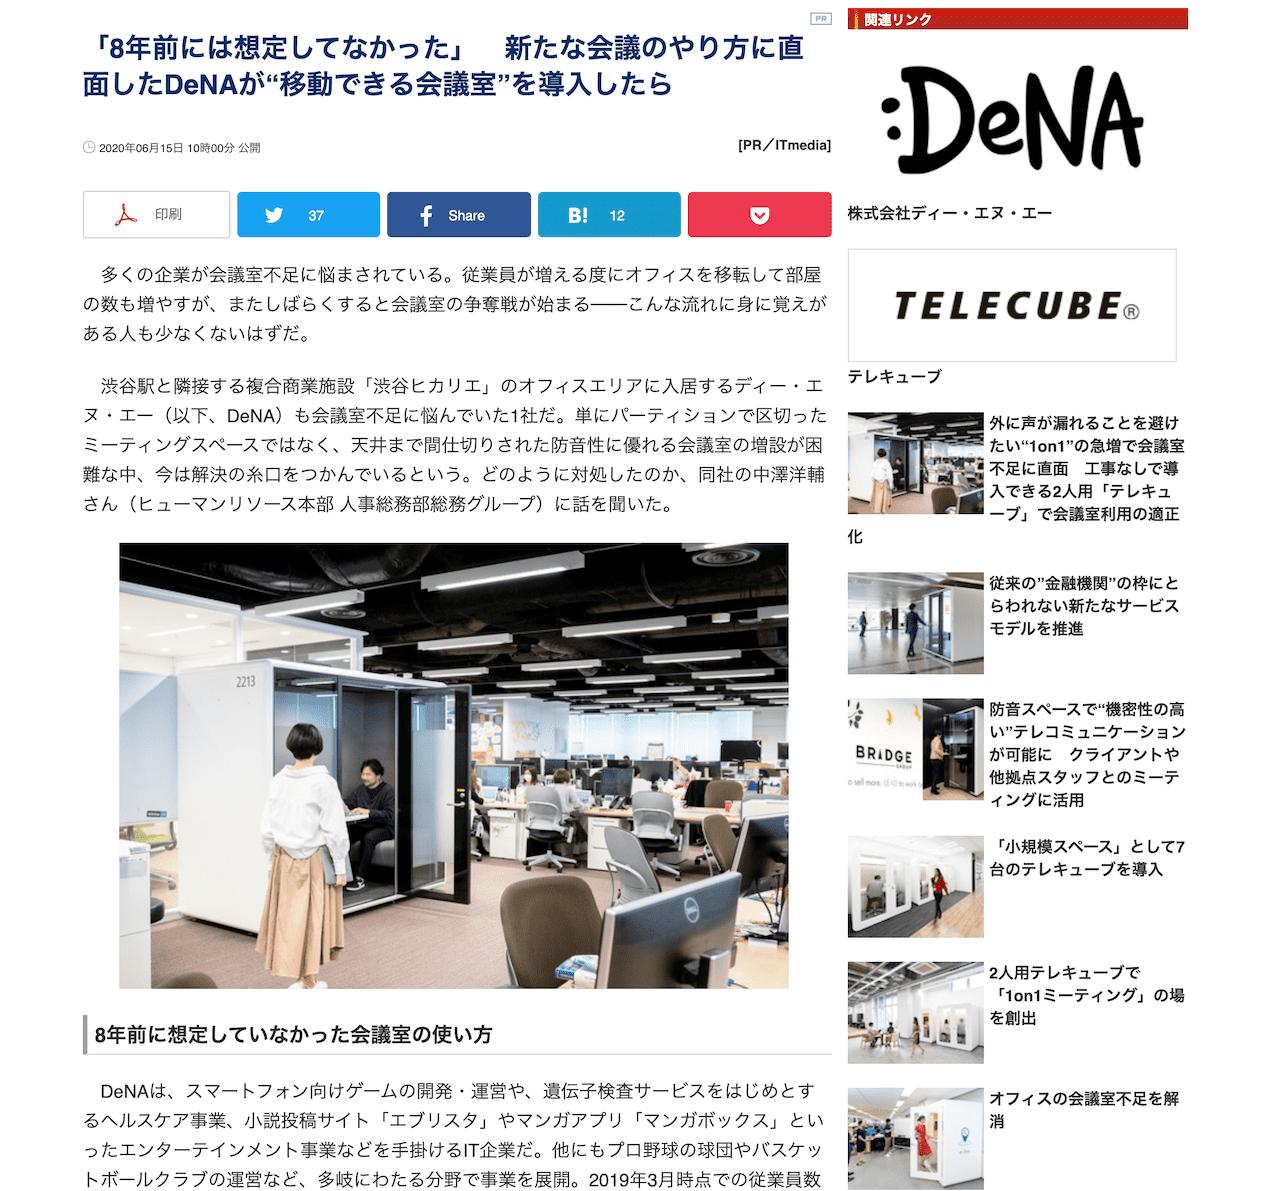 K020-007-itmedia-new-dena-case-study-02